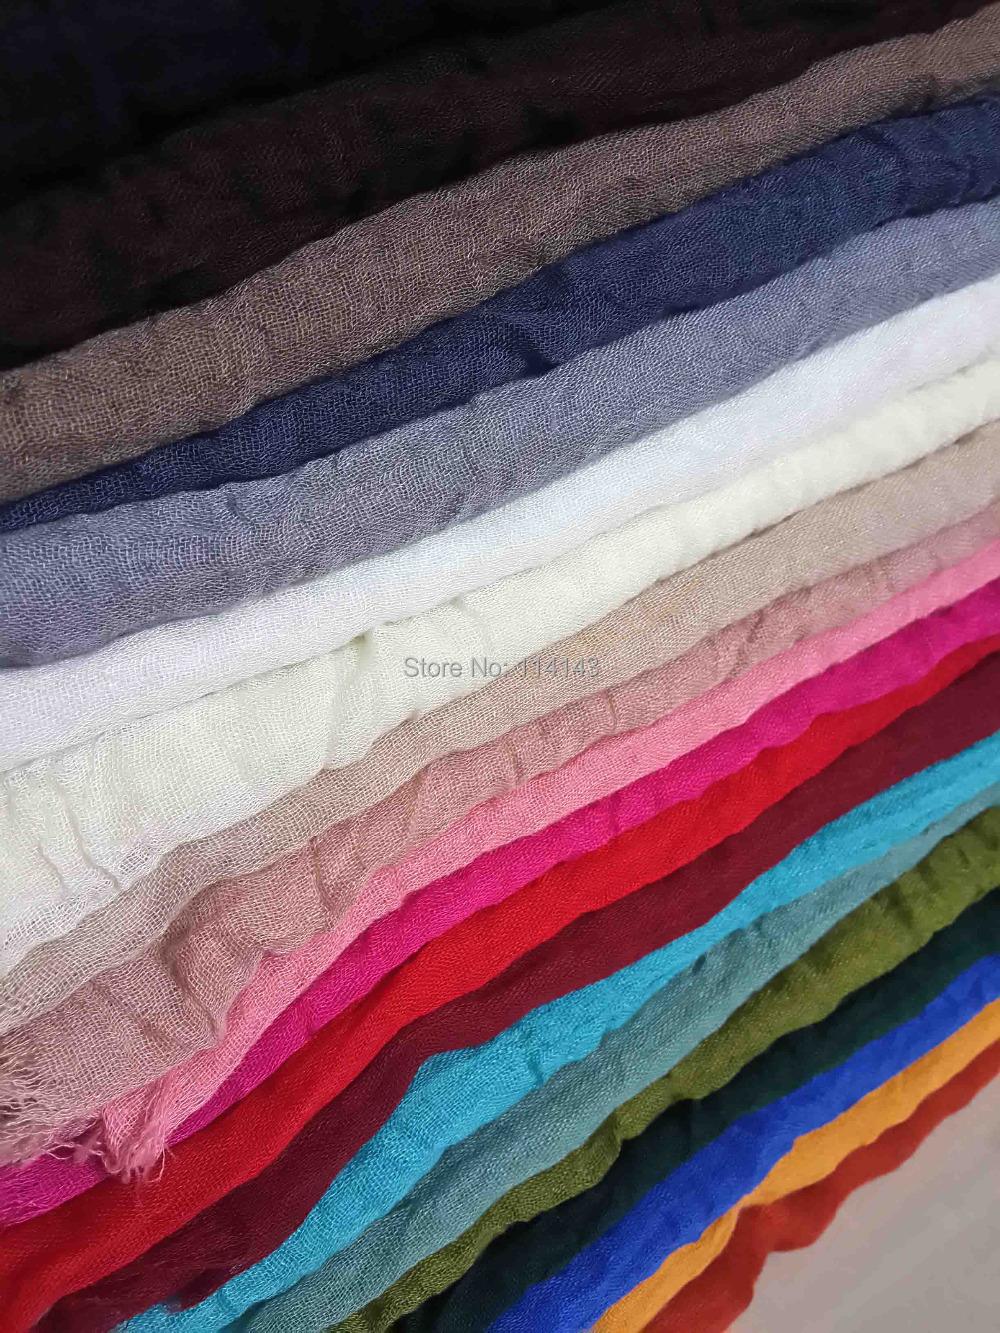 10pcs/lot Soft Oversize Frayed Edges Plain Solid Color Cotton Scarf Hijab Shawl Wrap, Free Shipping(China (Mainland))